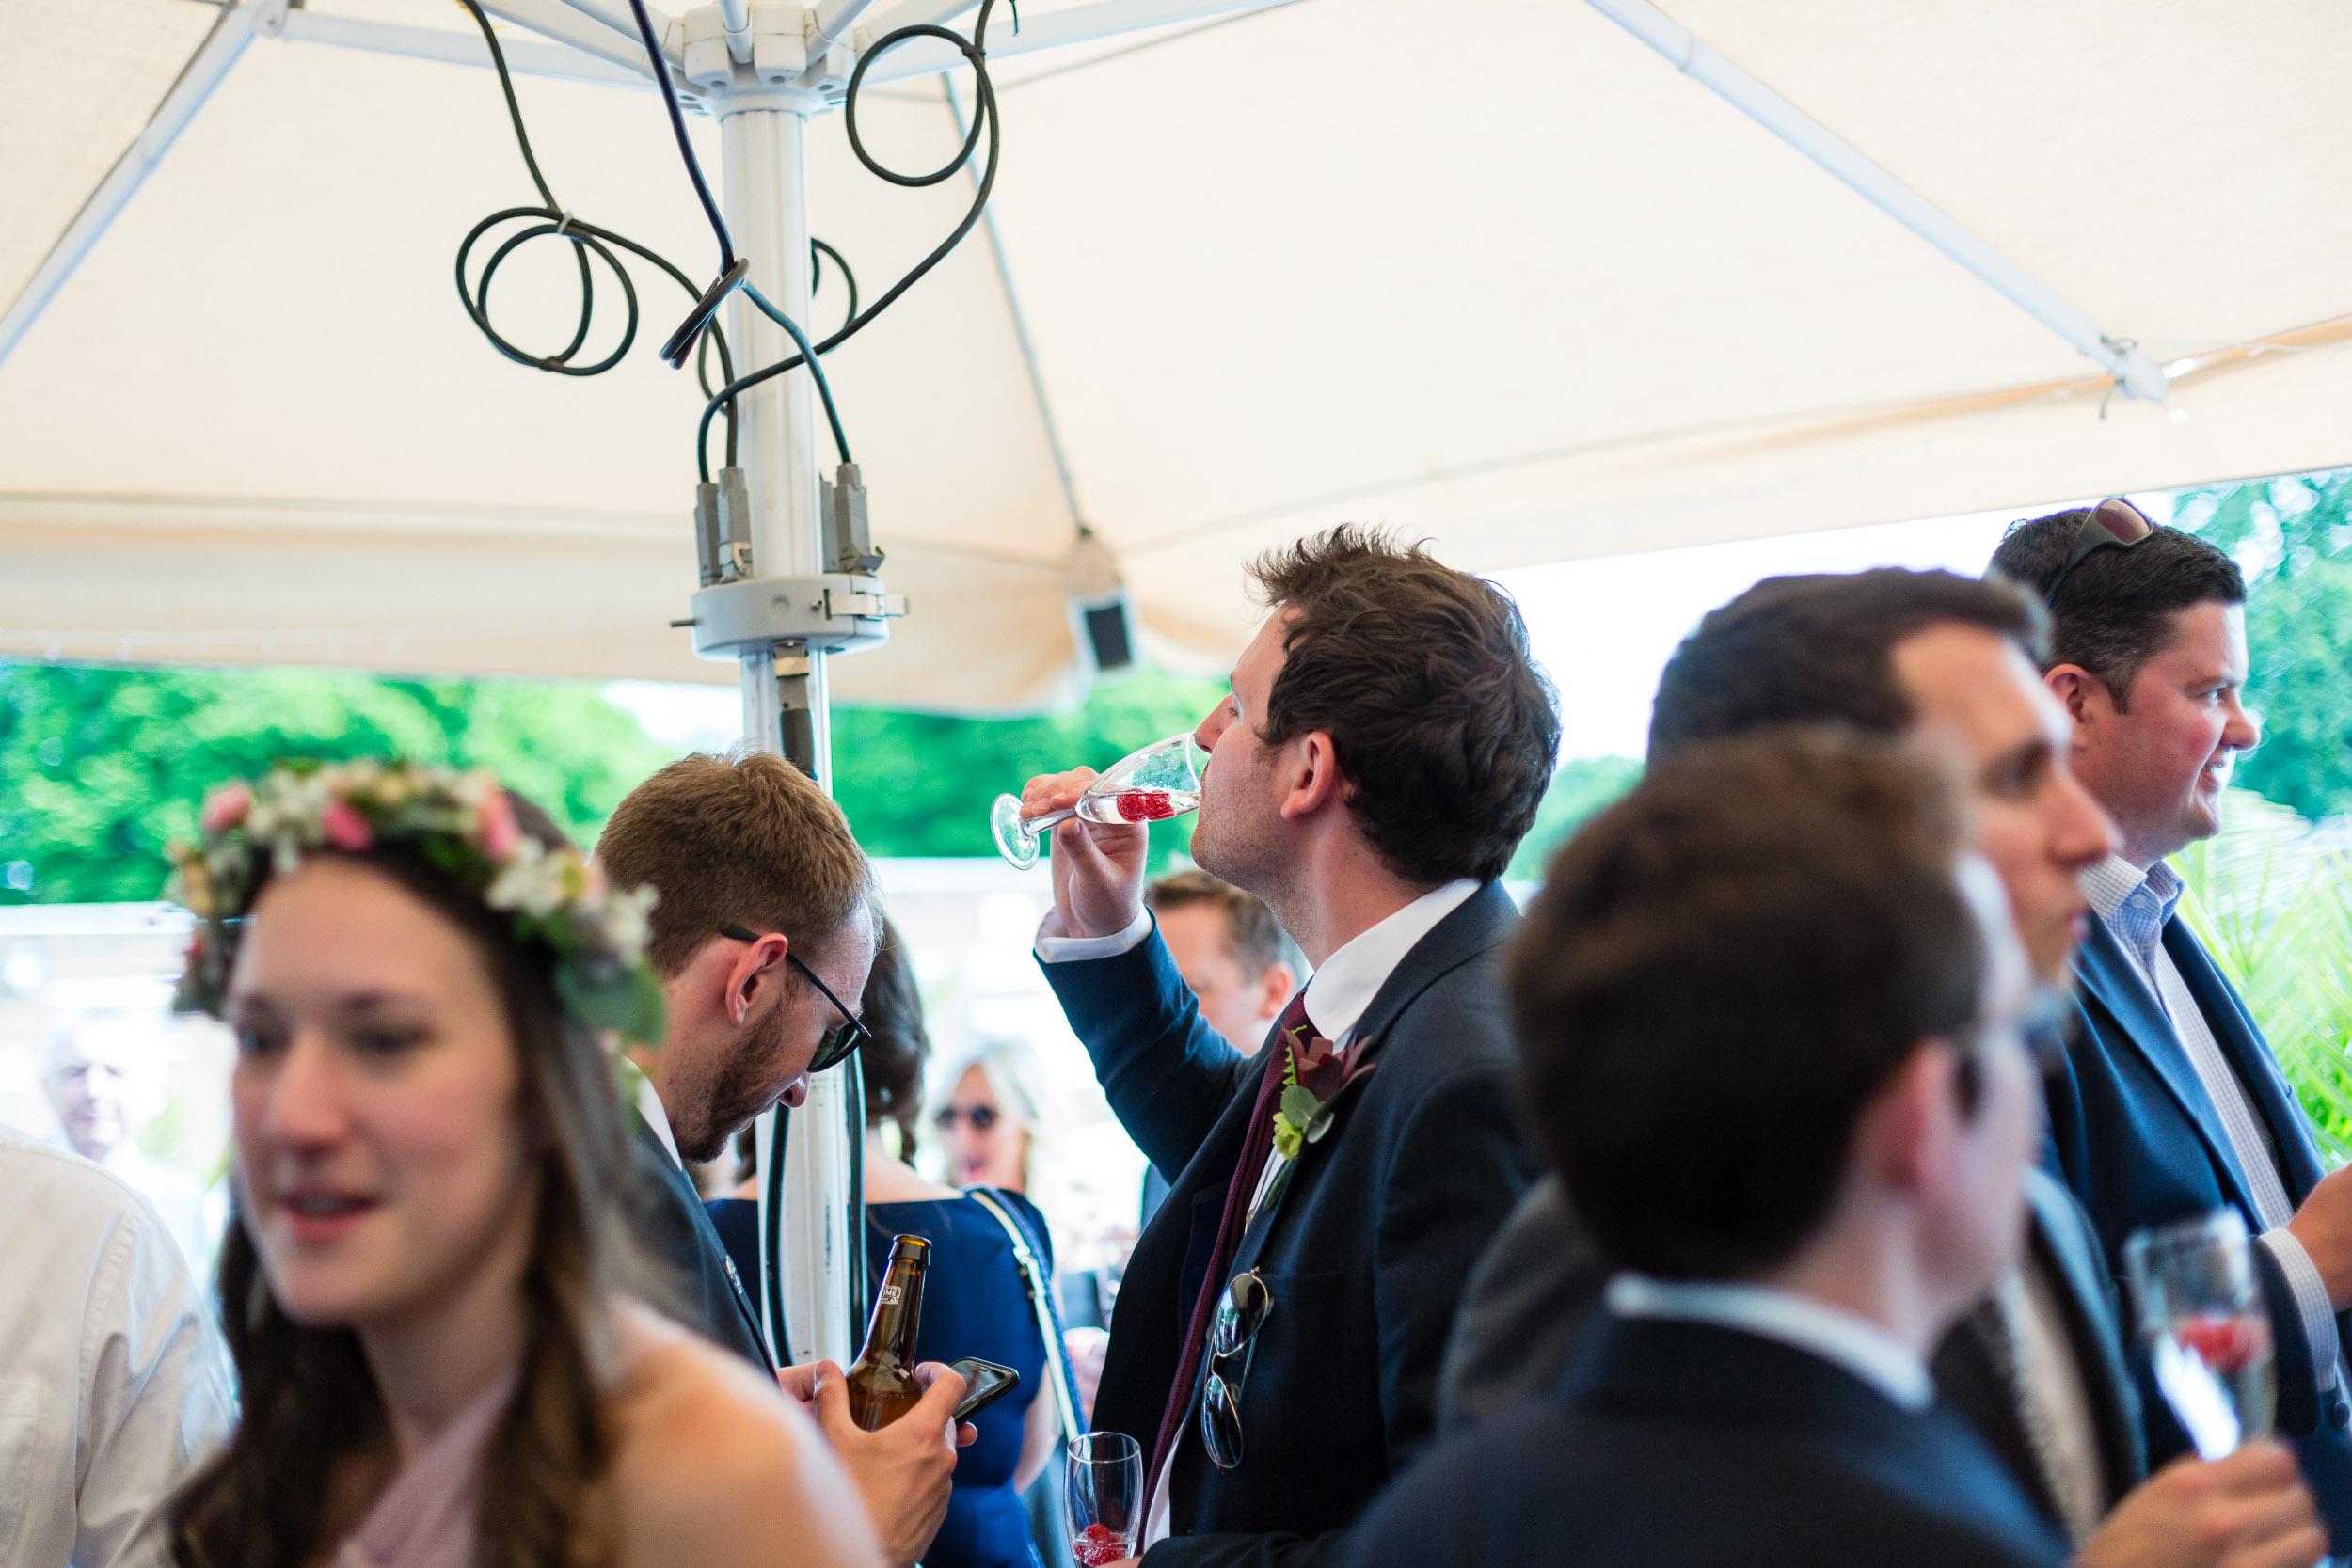 brockwell-lido-brixton-herne-hill-wedding-234.jpg